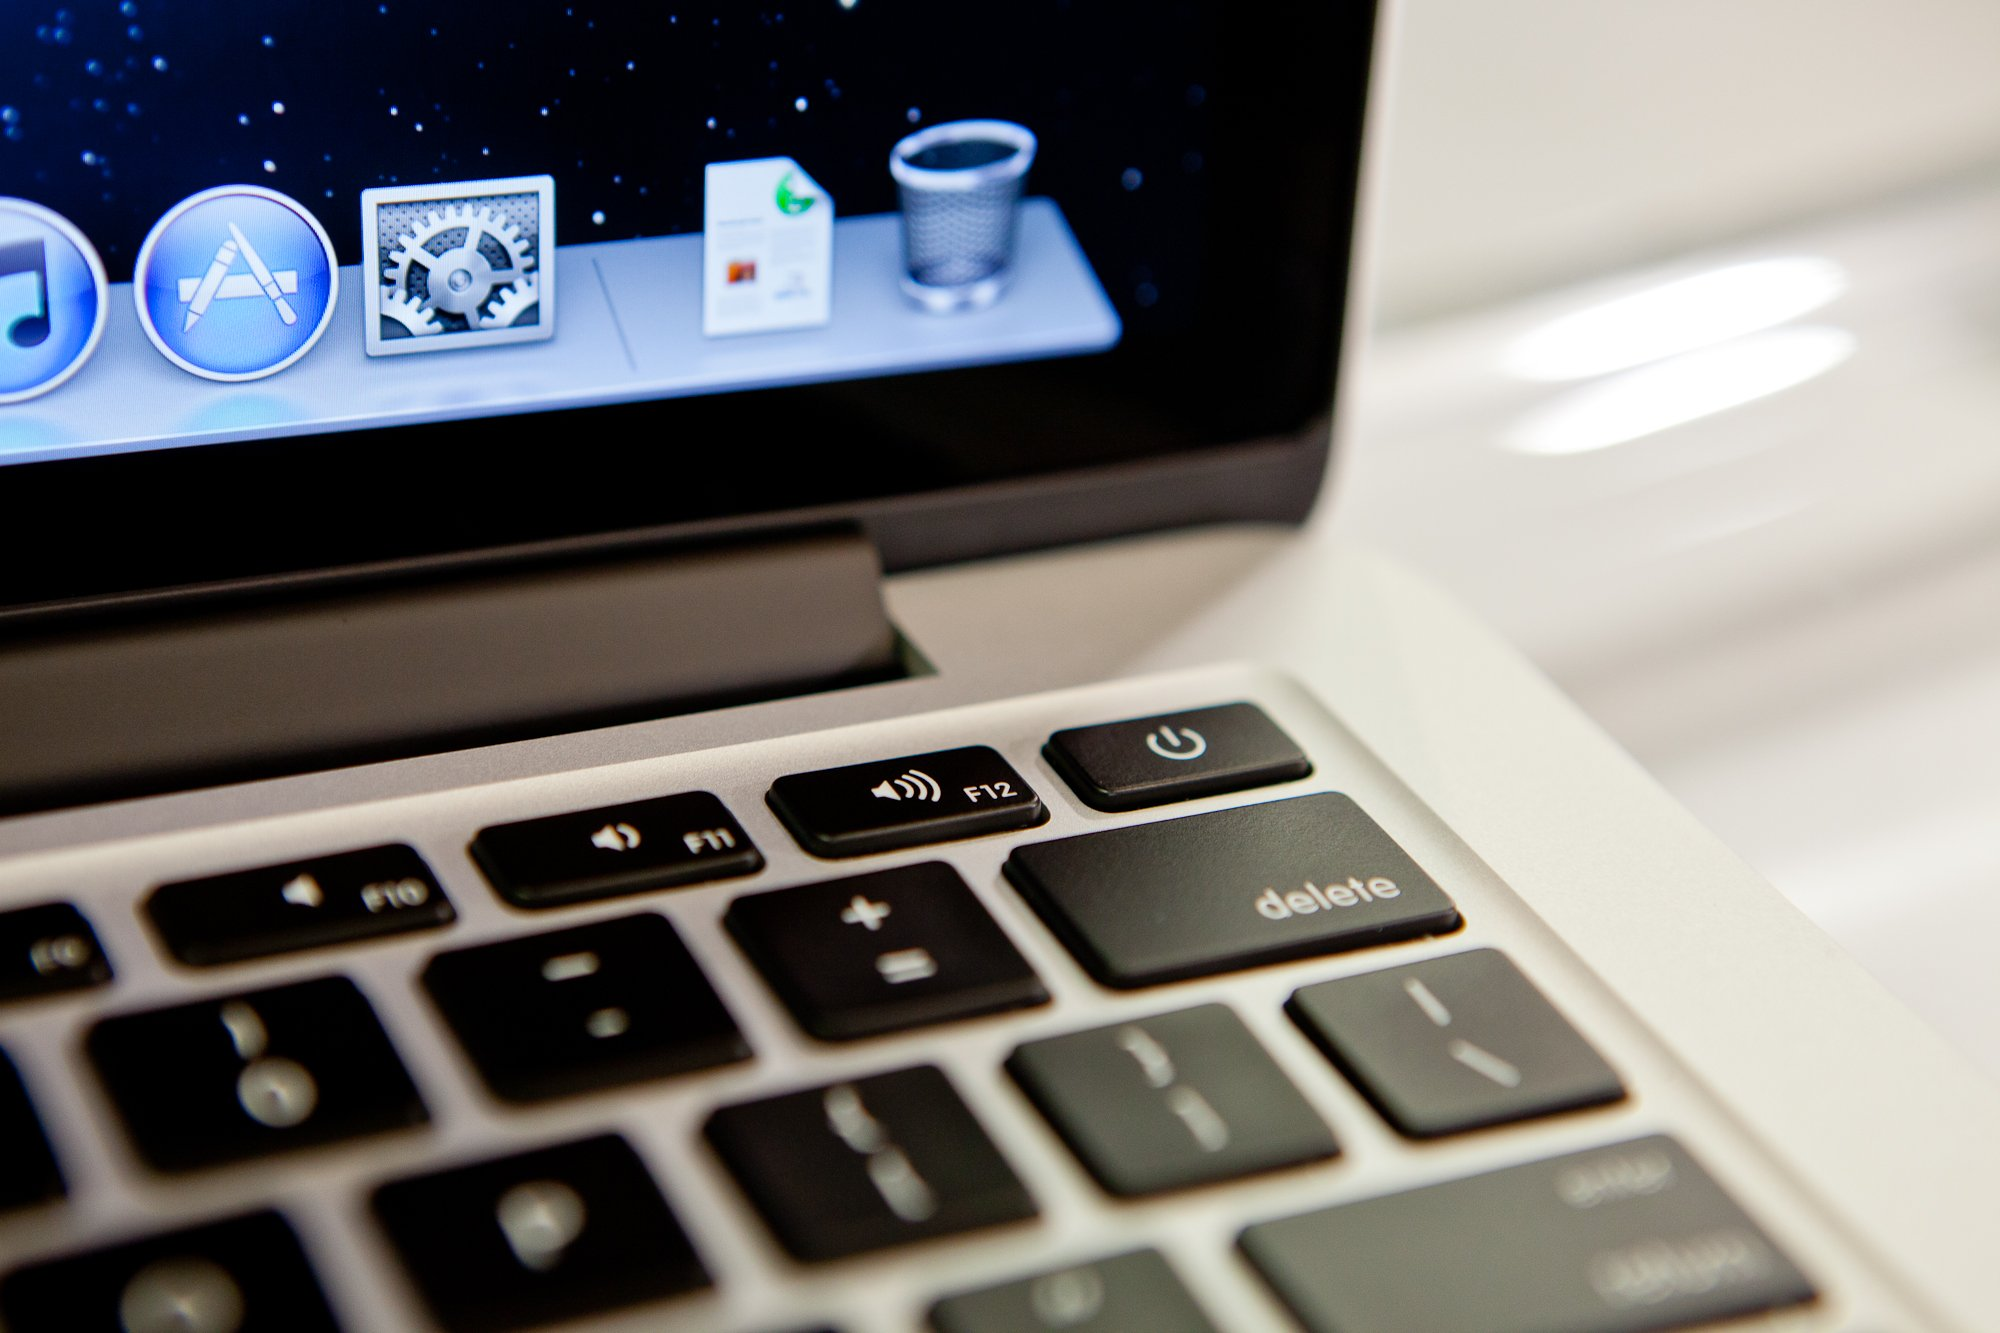 Menyembunyikan Data Penting Pada Komputer Dengan System Operasi Mac_3